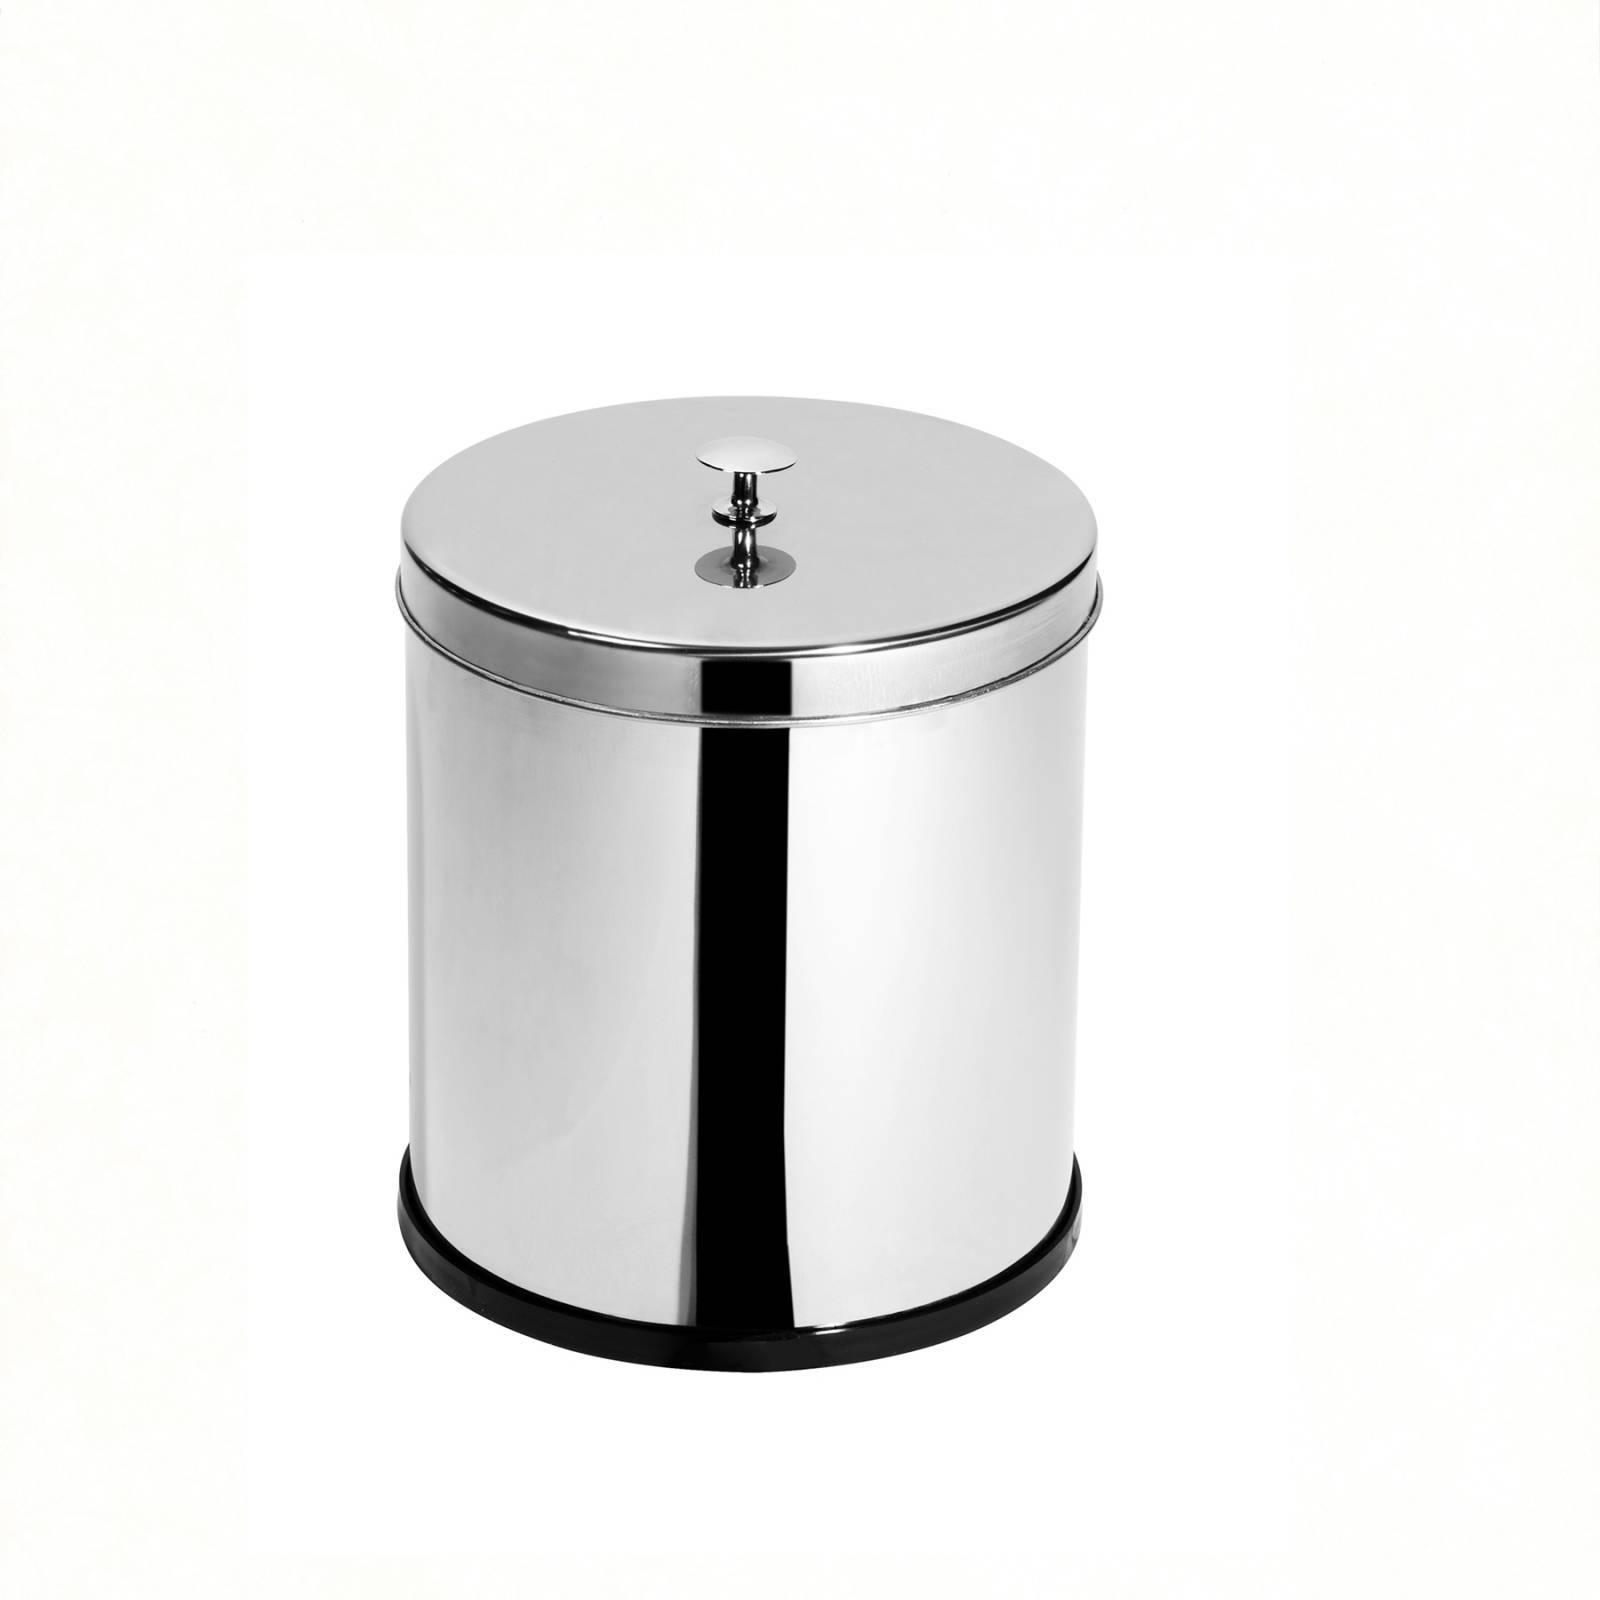 Lixeira Inox c/ tampa e puxador 6,9 Litros - Elegance